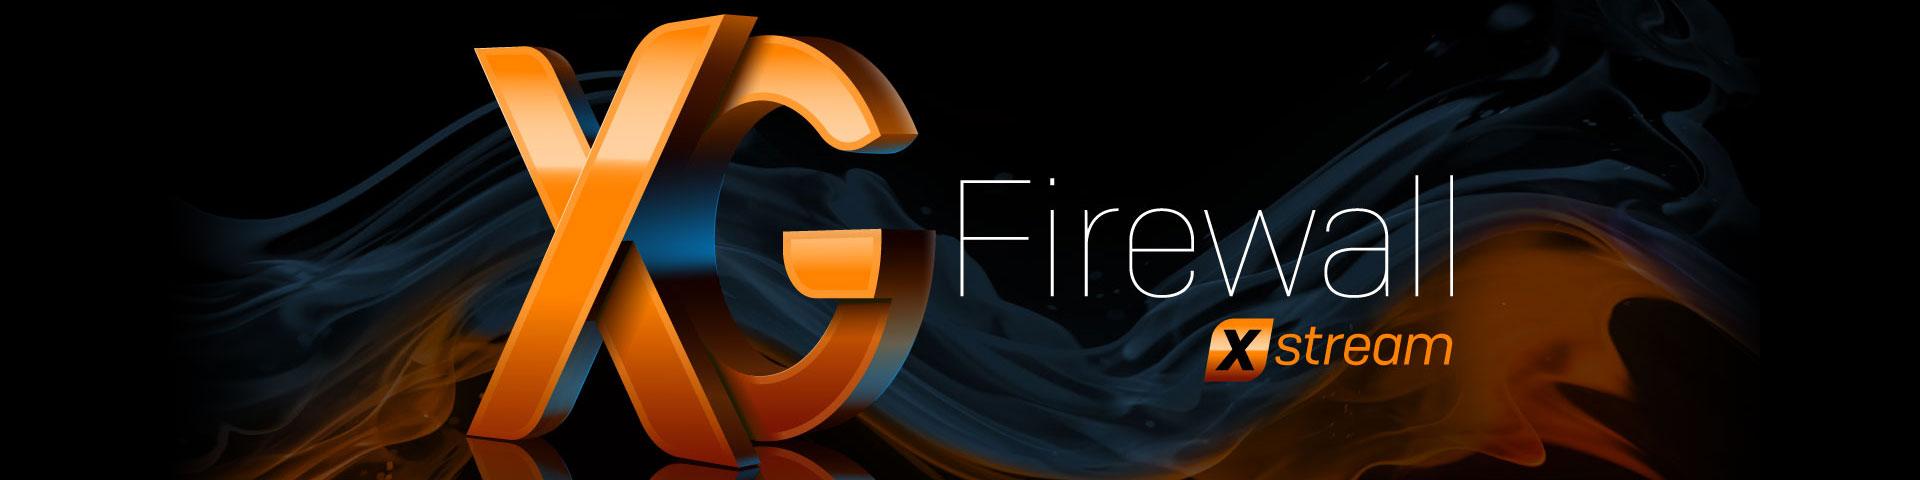 post sophos xg firewall